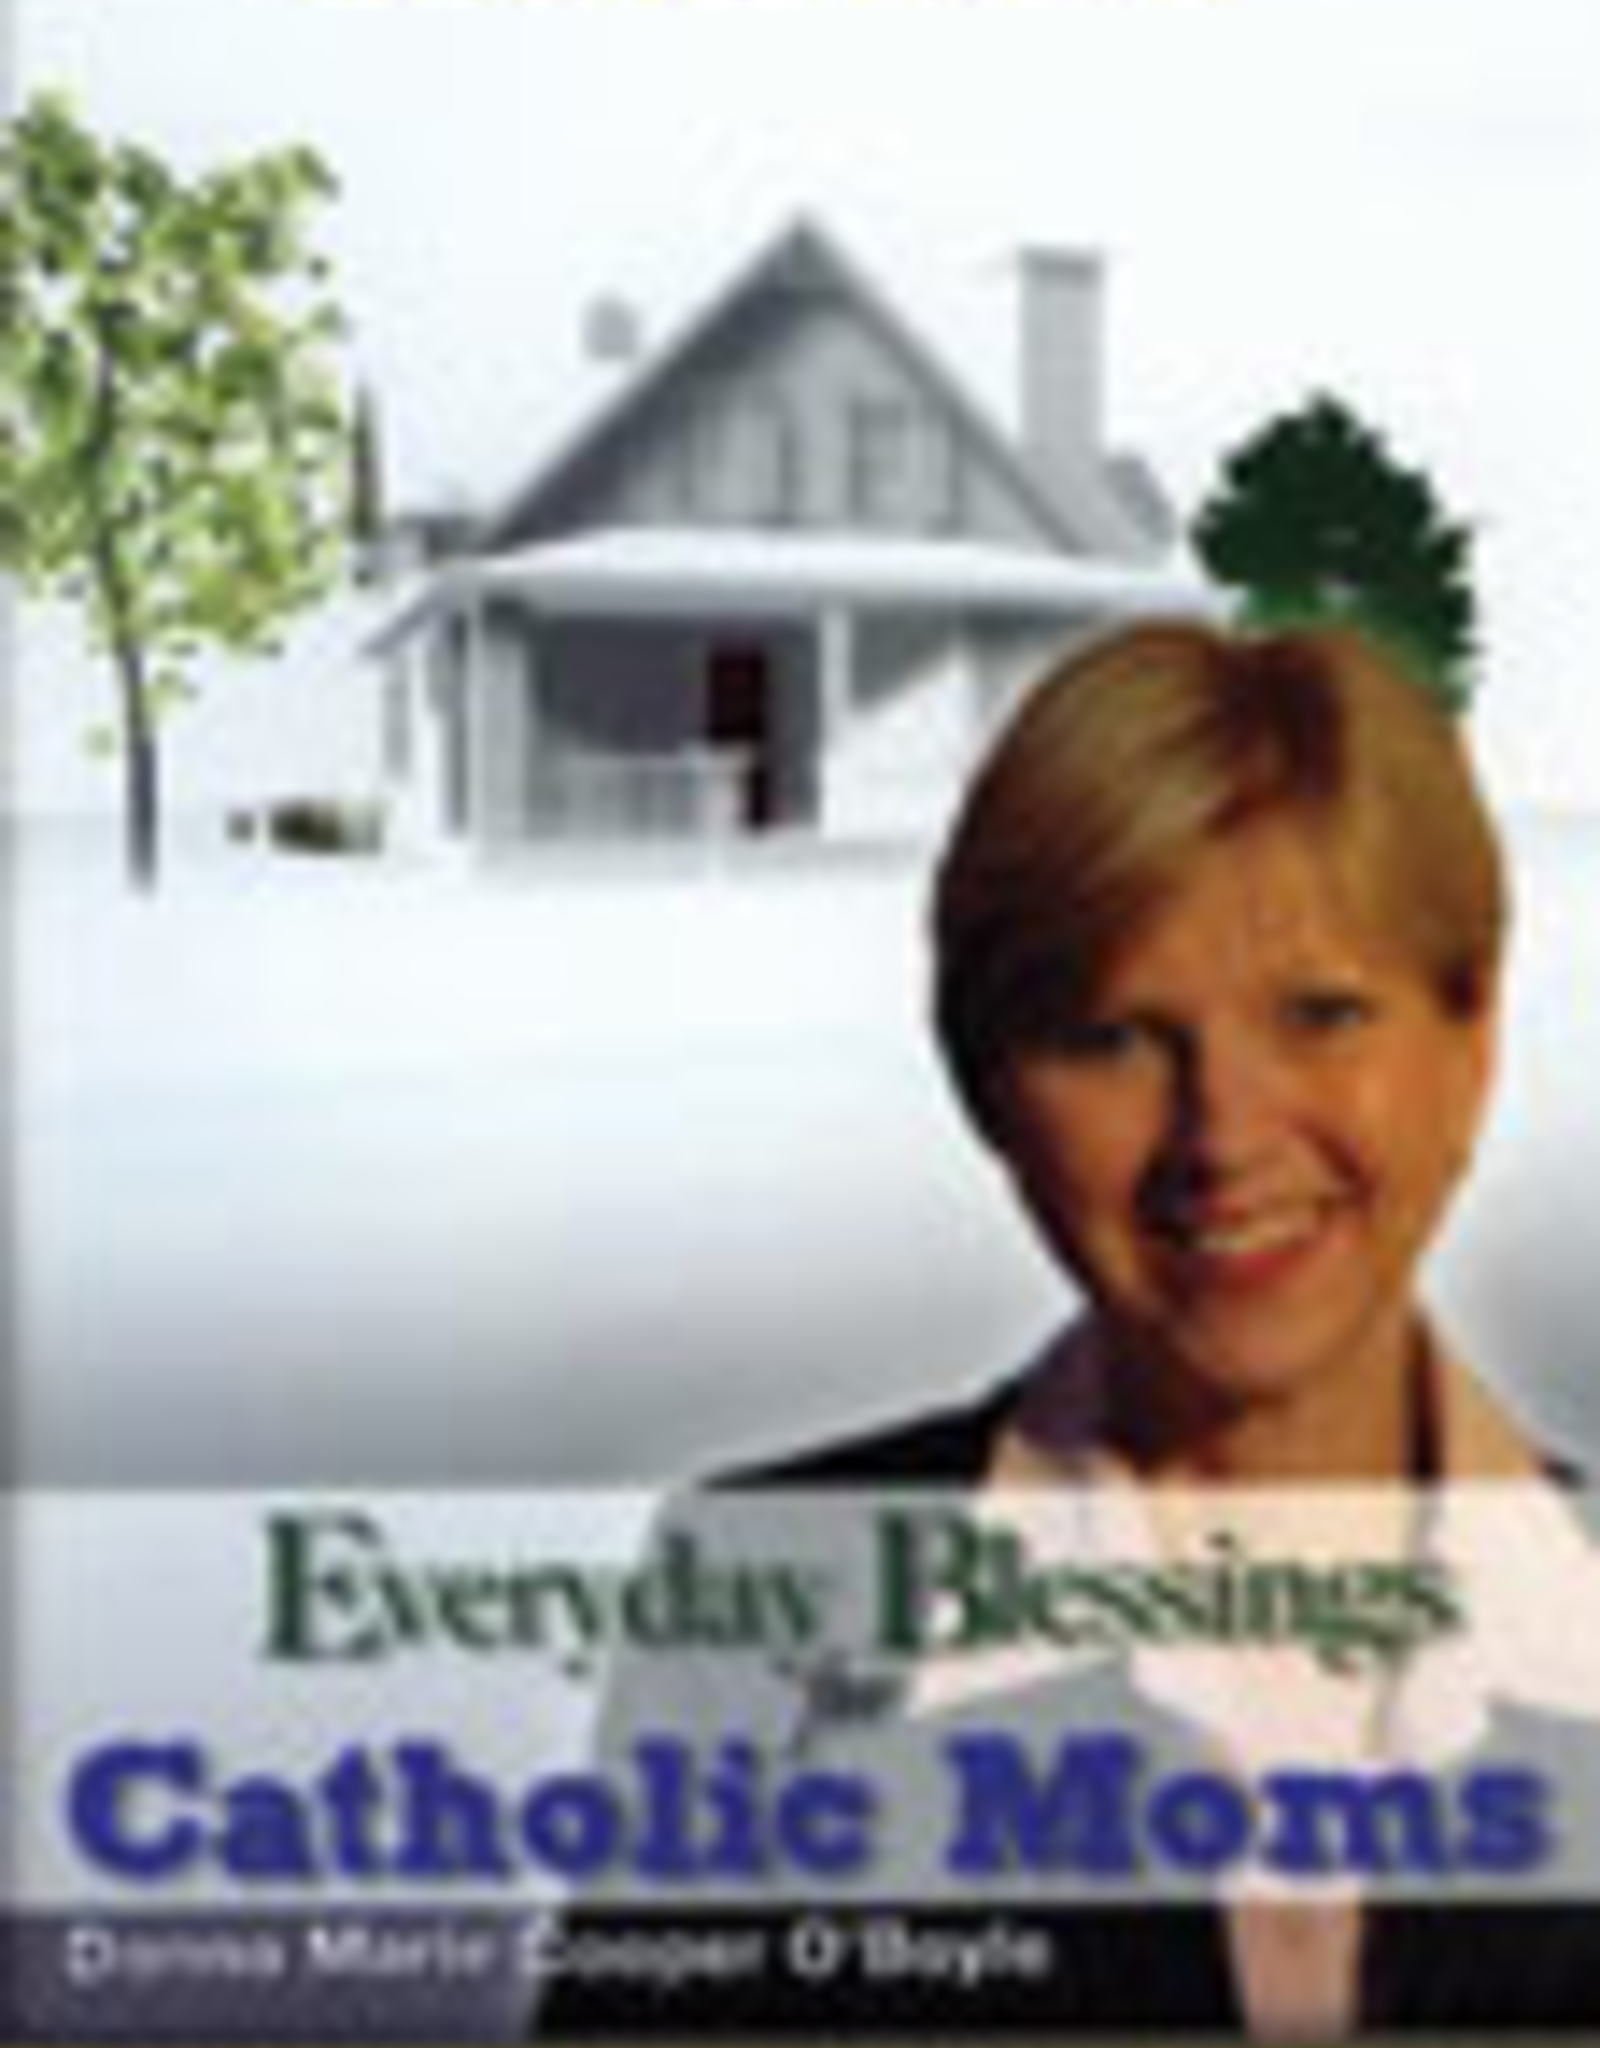 Ignatius Press Everyday Blessings for Catholic Moms (DVD)